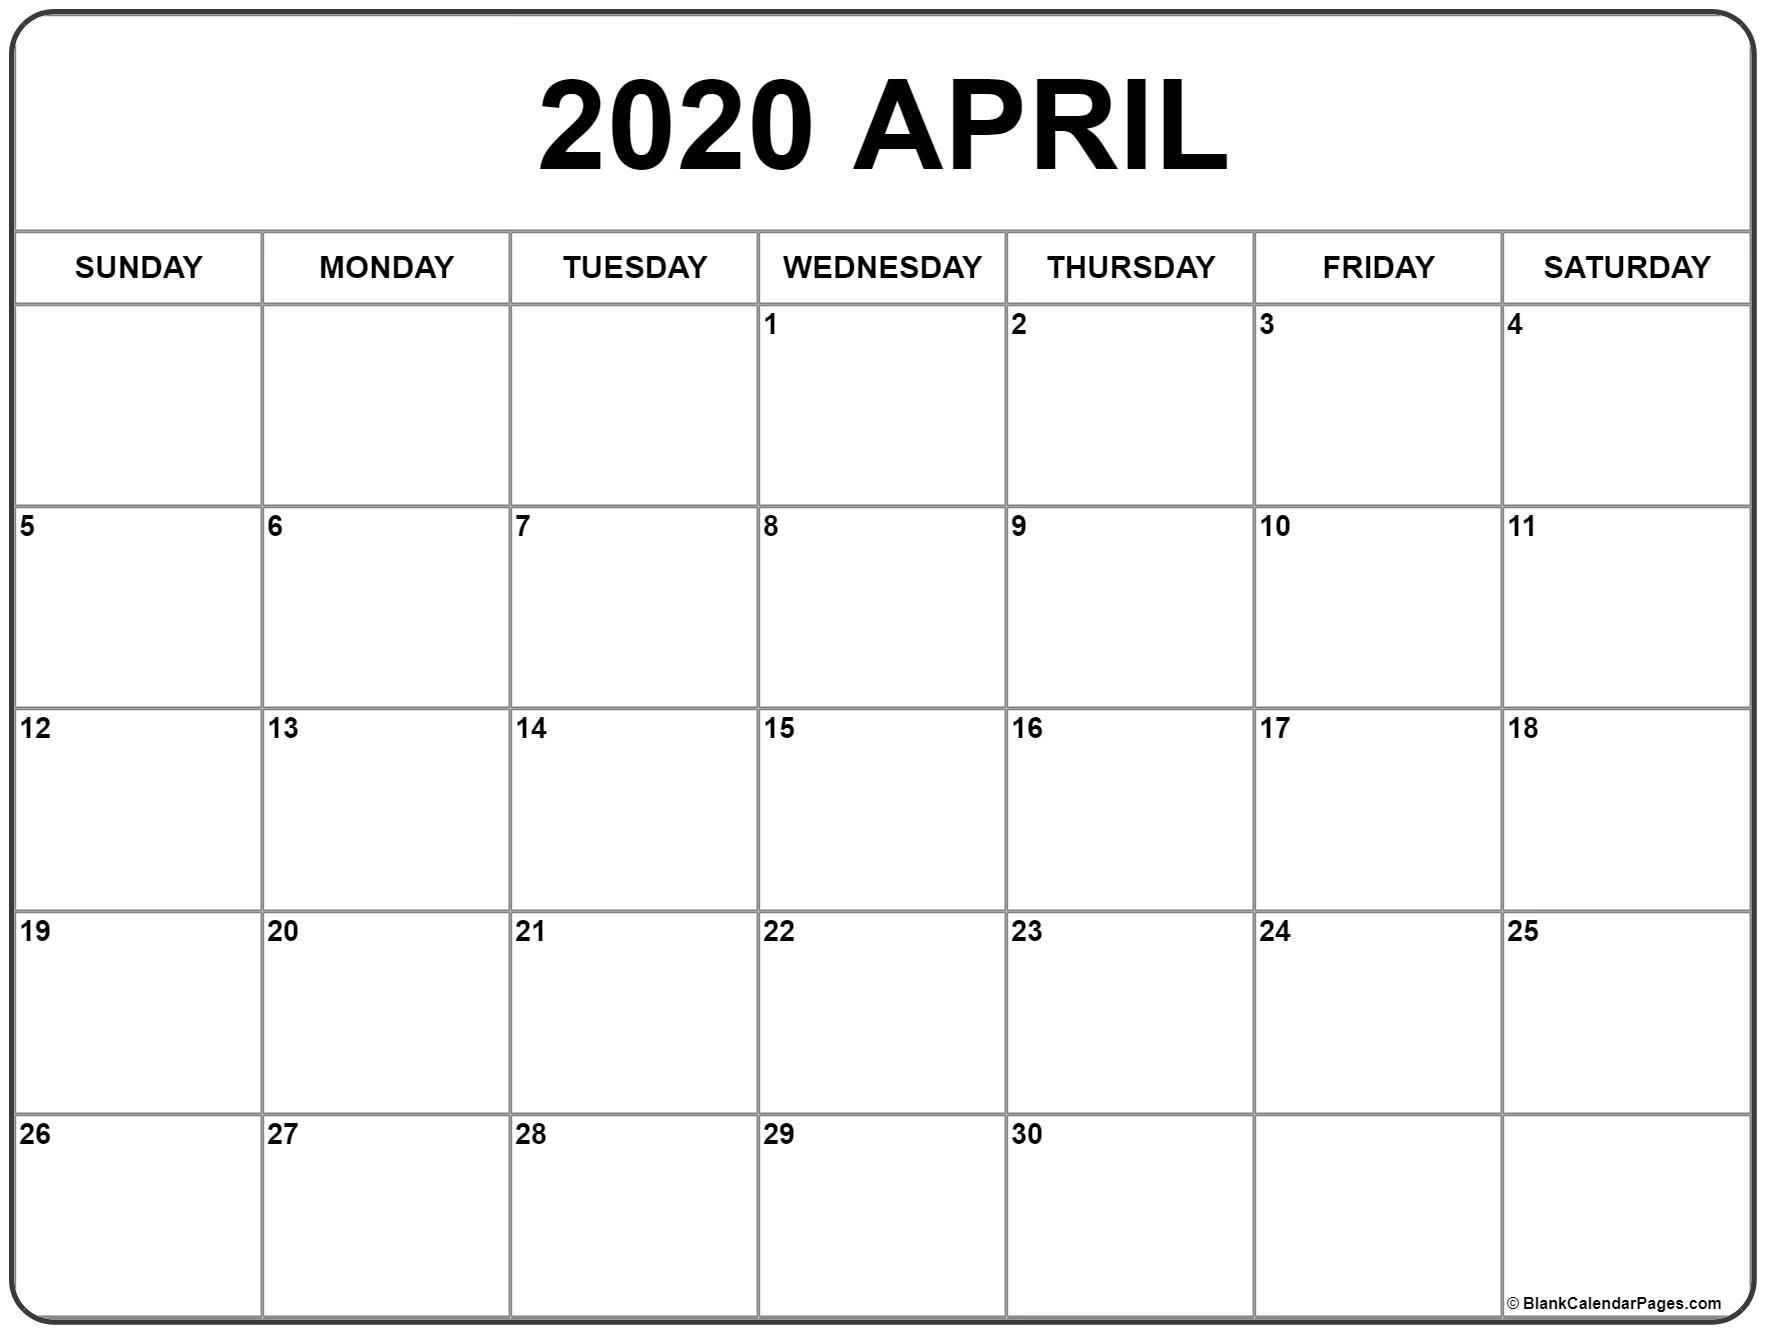 April 2020 Calendar | Free Printable Monthly Calendars-Printable Monthly Bill Pay Calendar 2020